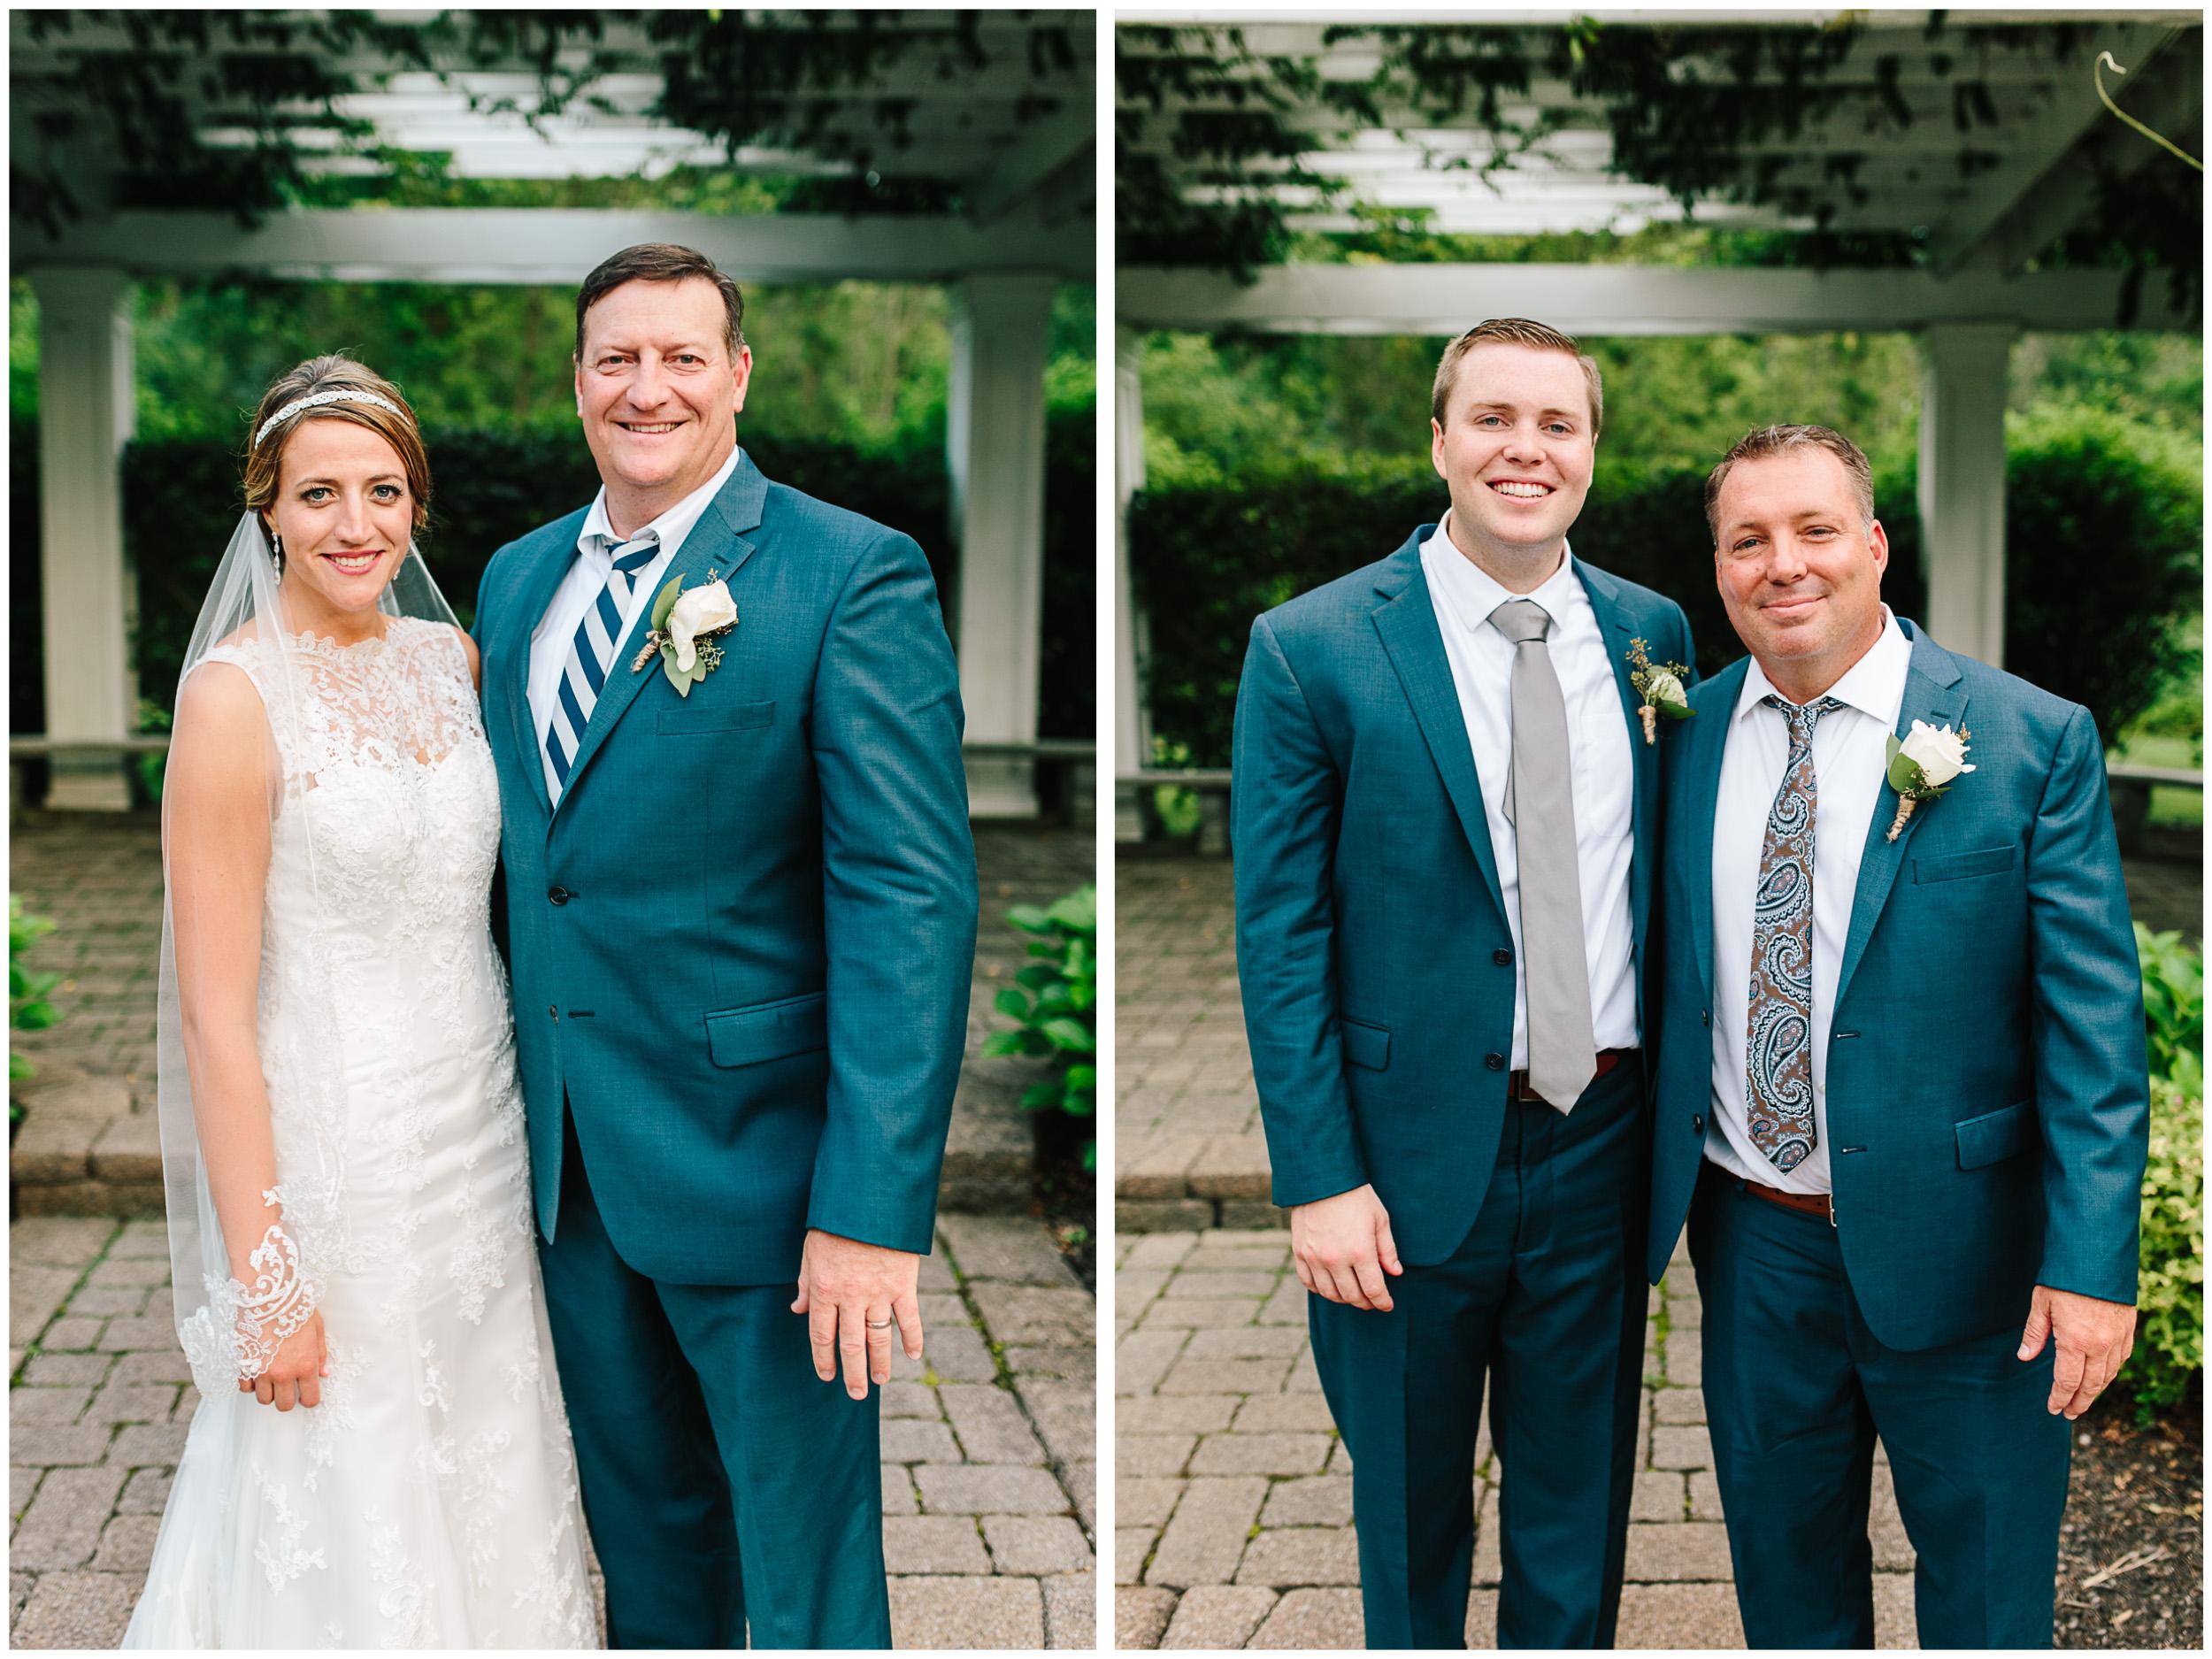 ann_arbor_michigan_wedding_73.jpg